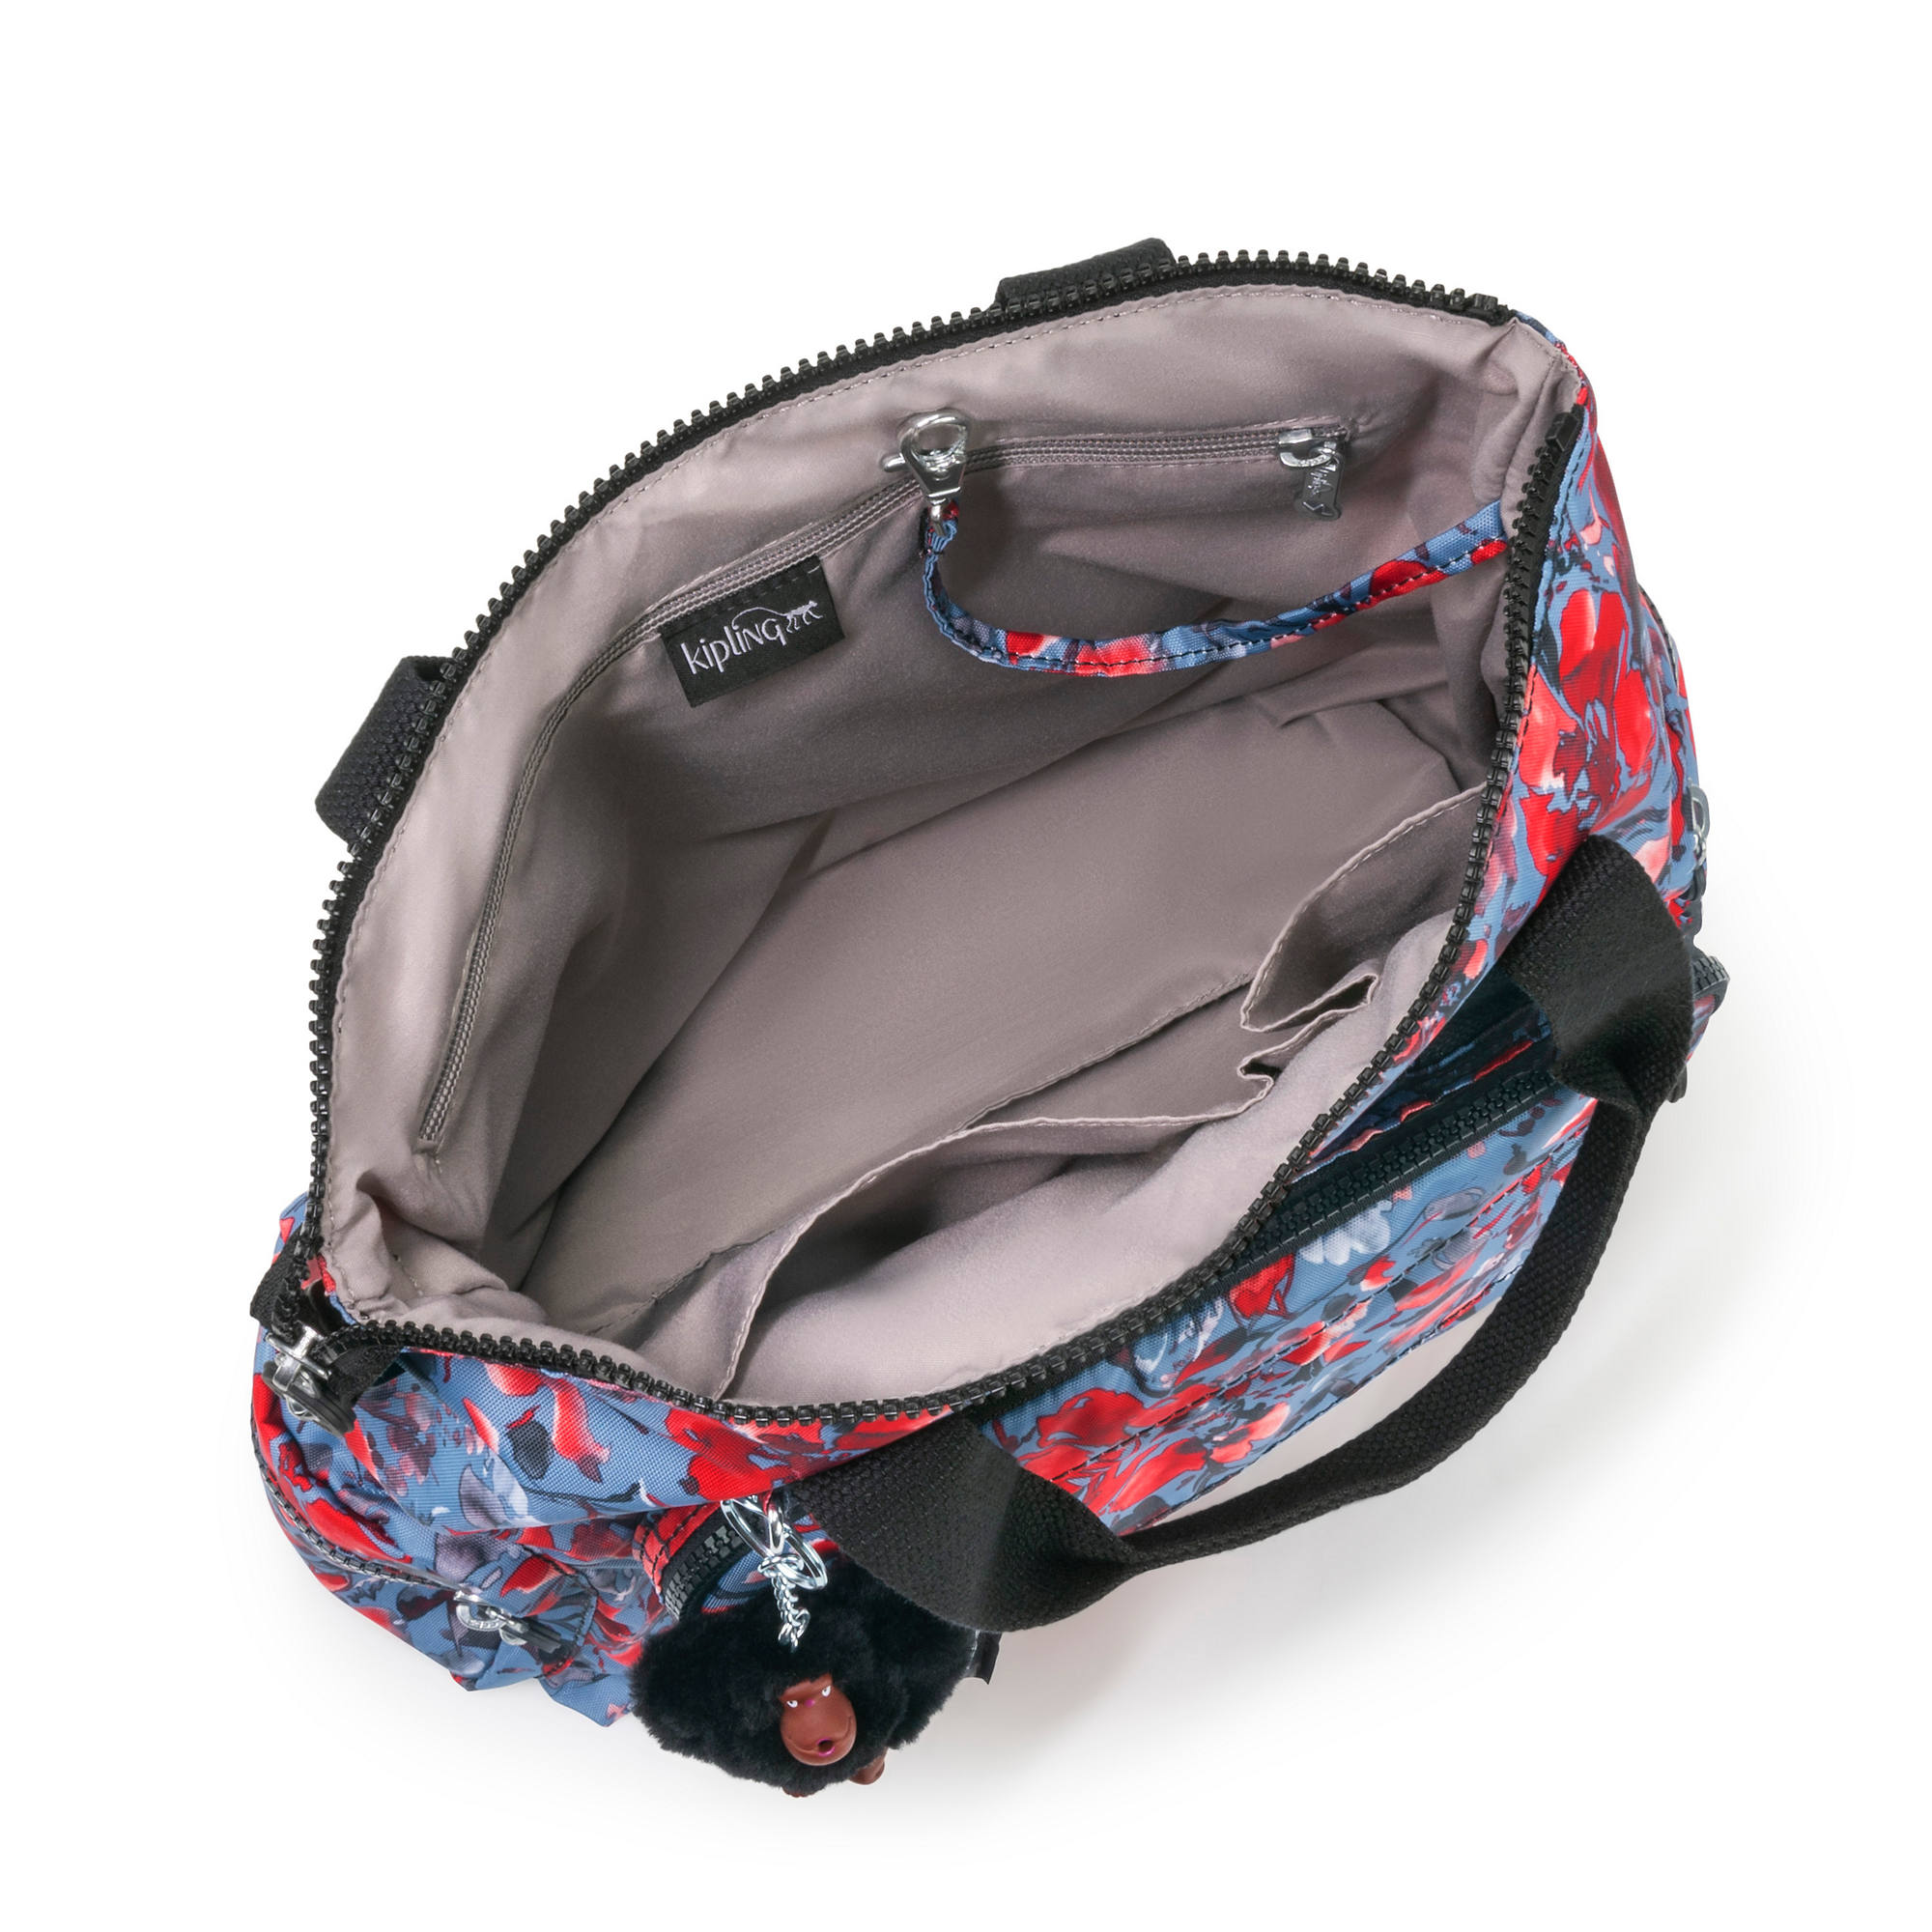 Kipling-Alvy-2-In-1-Convertible-Tote-Bag-Backpack miniatura 24